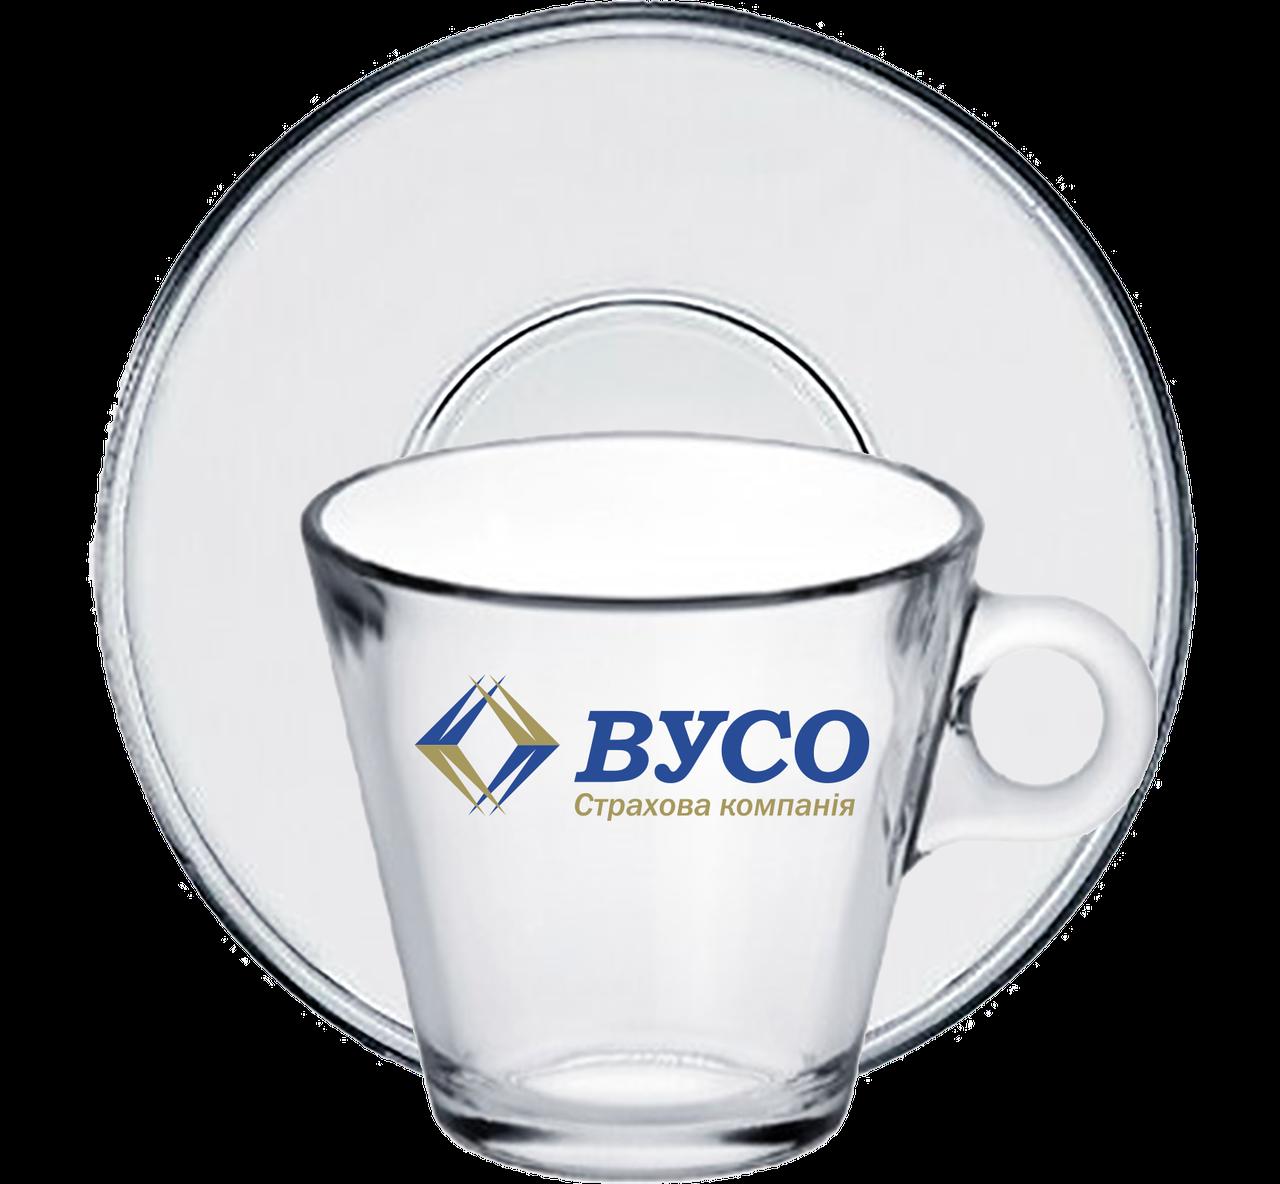 Чашка с логотипом 80 мл